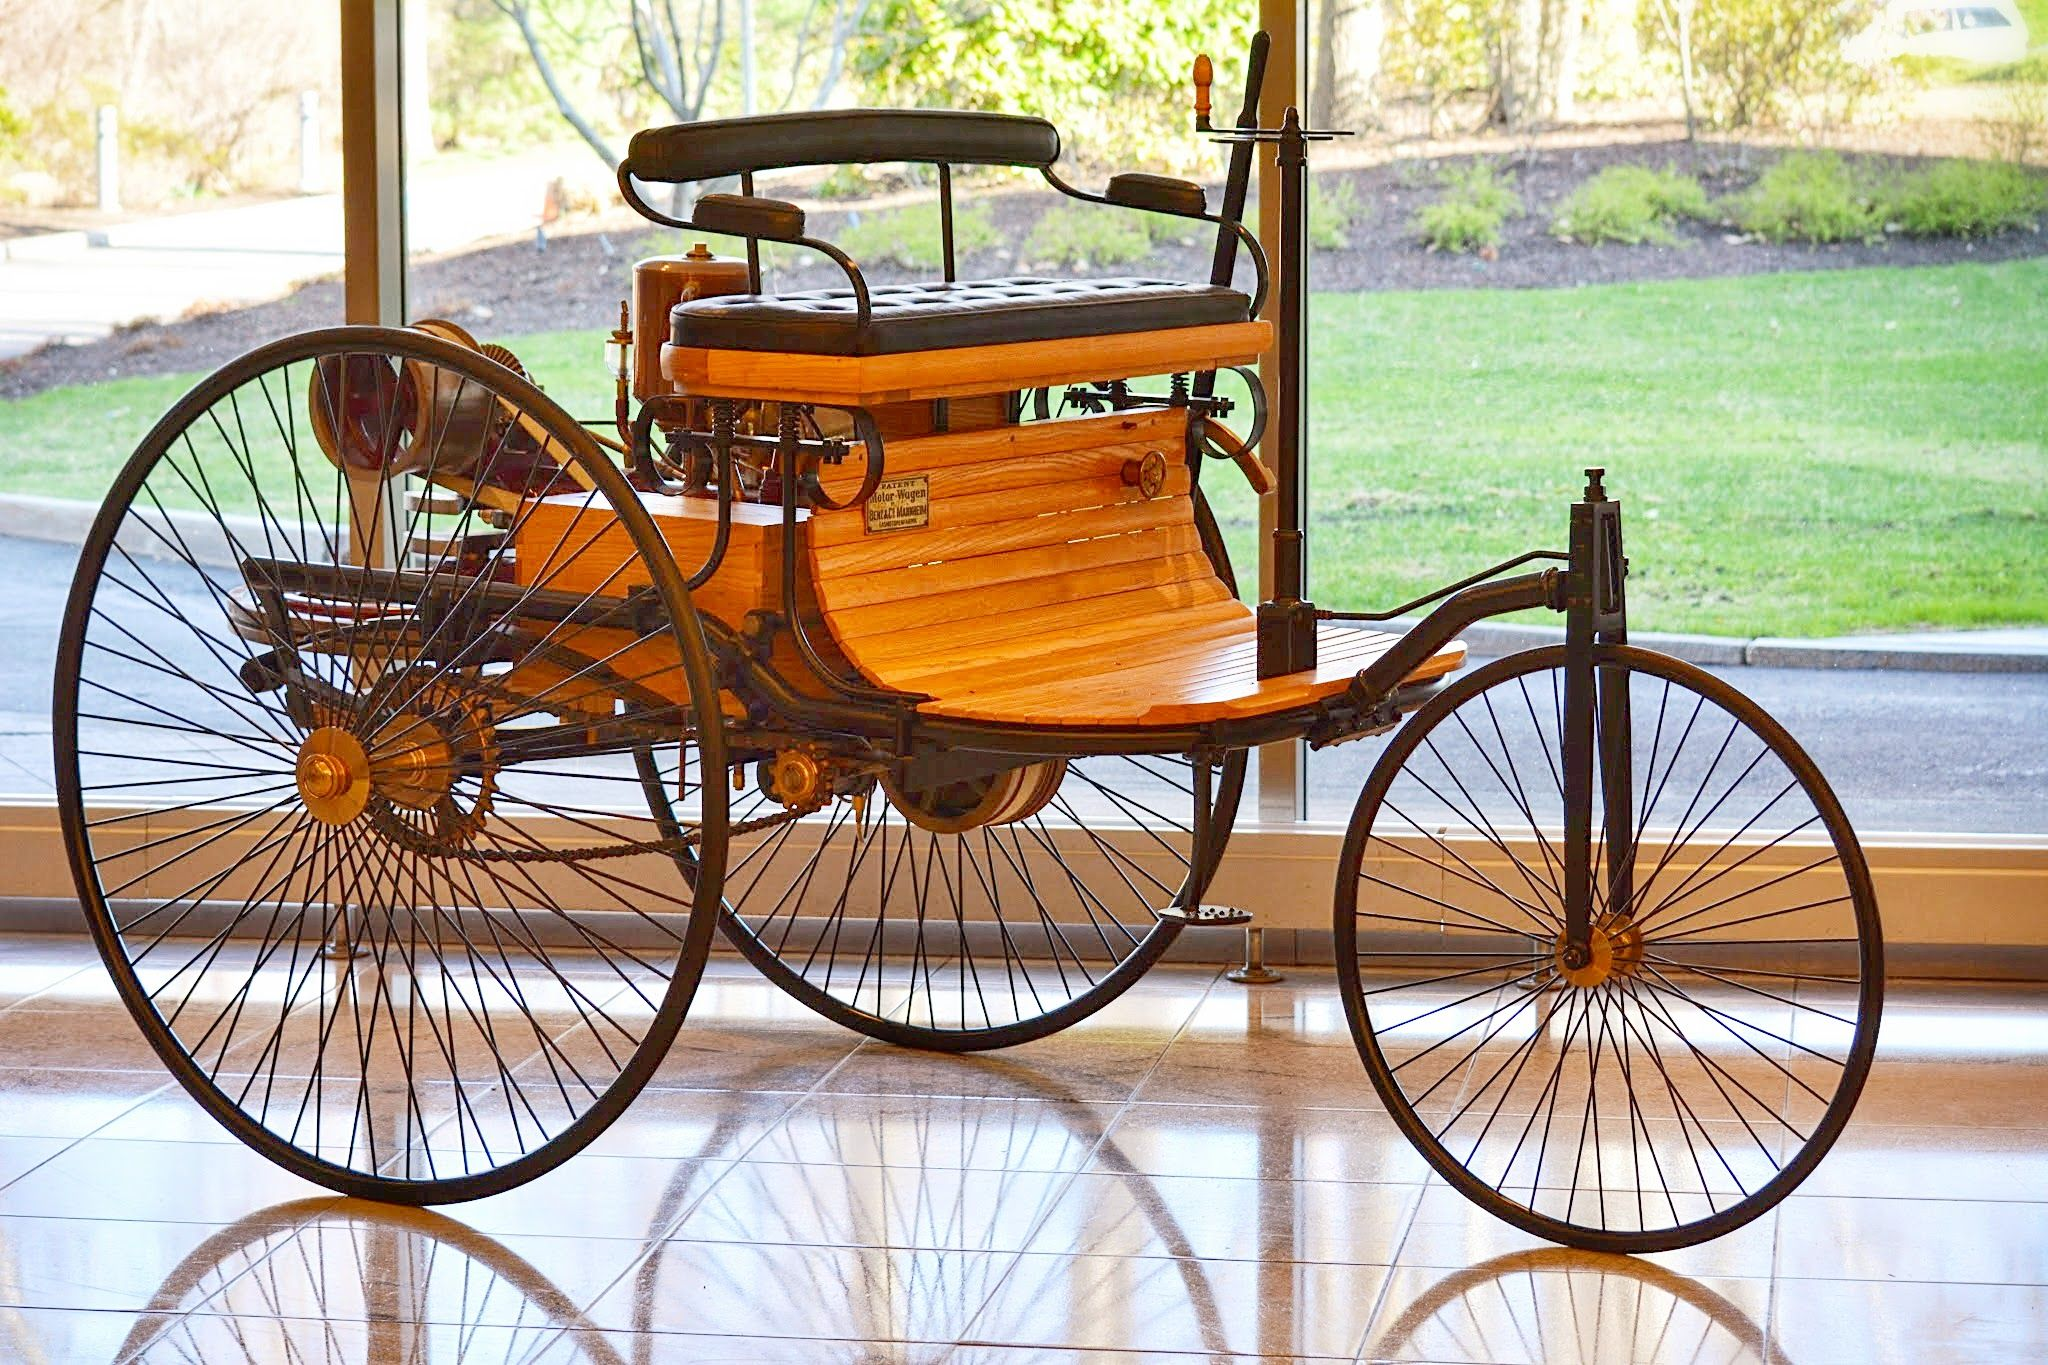 The Benz Patent-Motorwagen (or motorcar), built in 1886, is widely ...